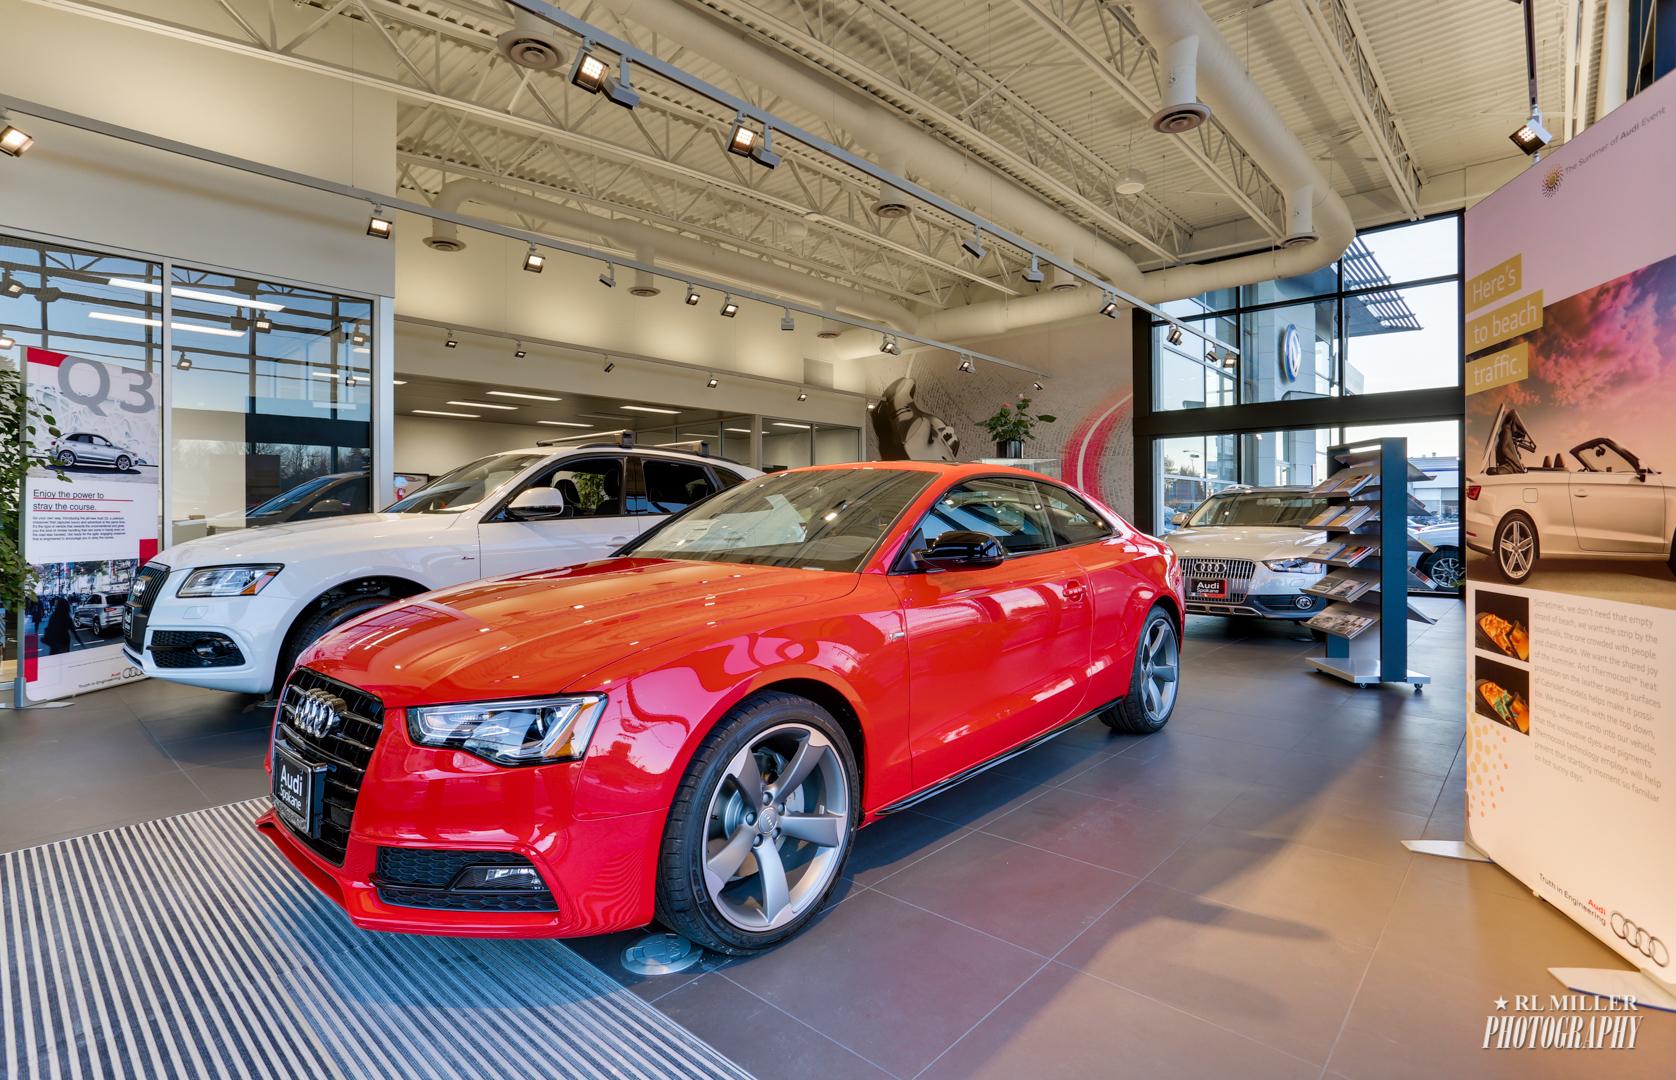 Audi Spokane RL Miller Photography - Audi spokane